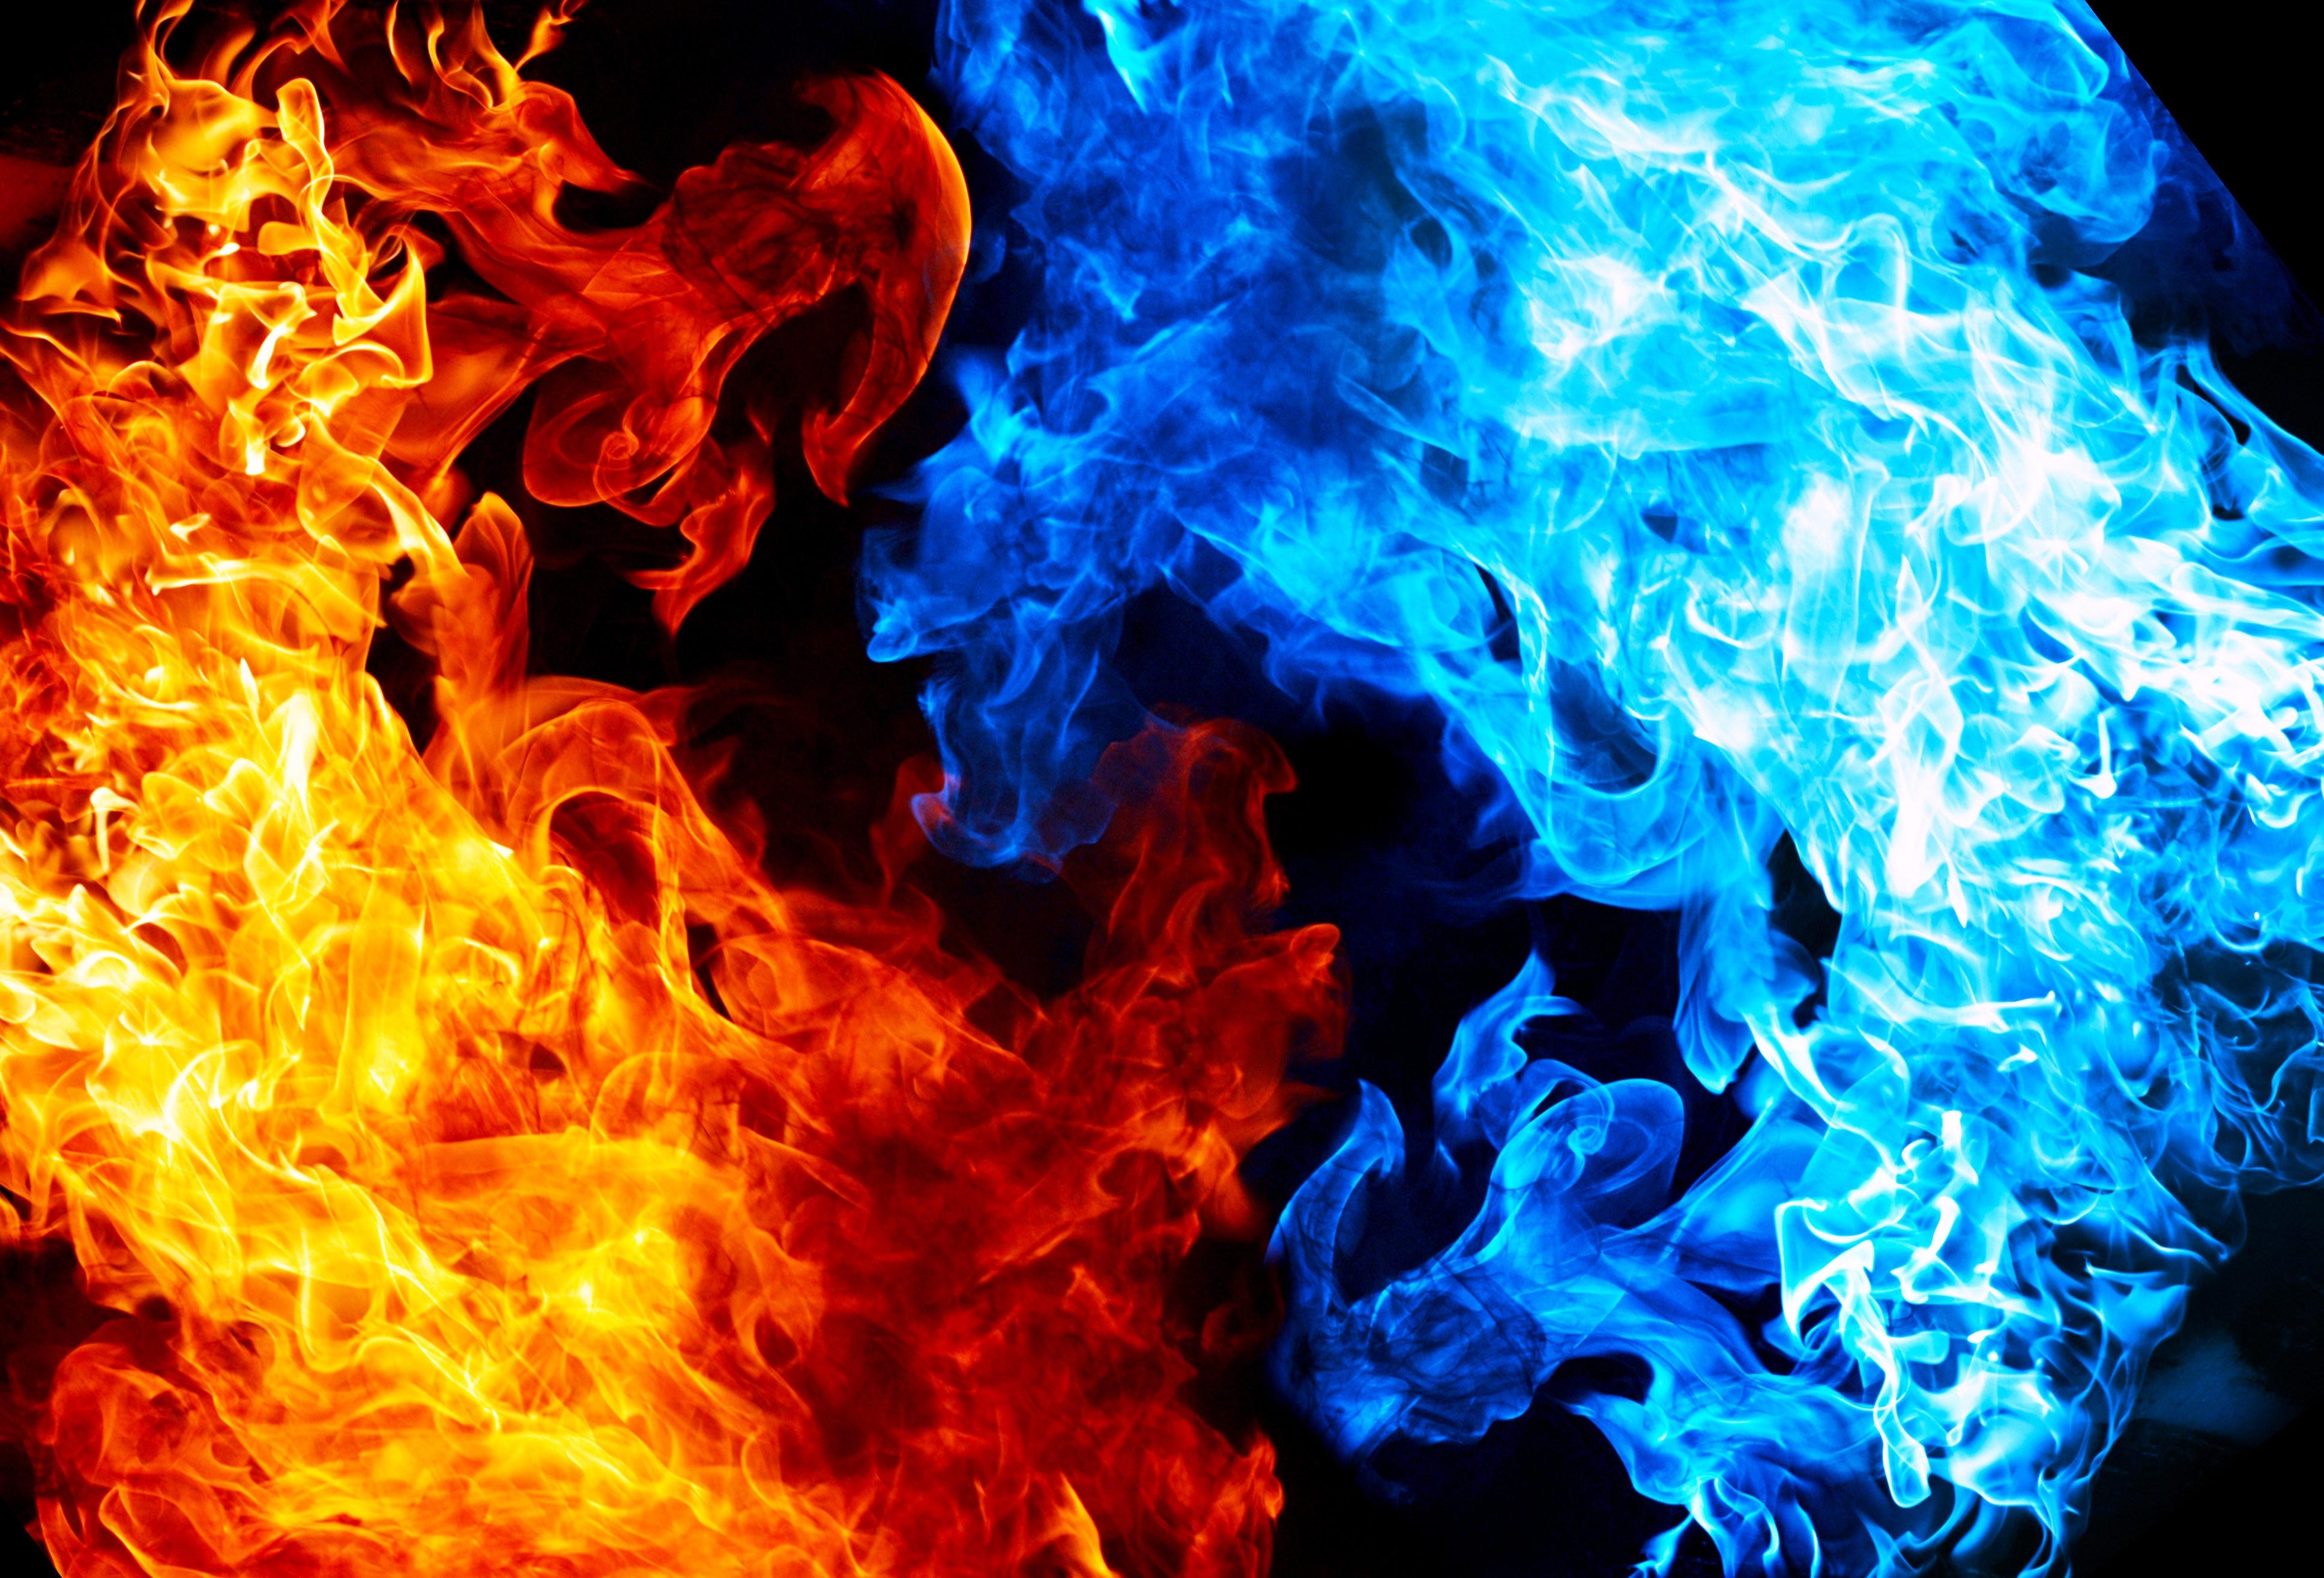 Fiery Treble Clef In Rainbow Flames: Wallpaper : Lights, Flames, Black Background 3871x2628